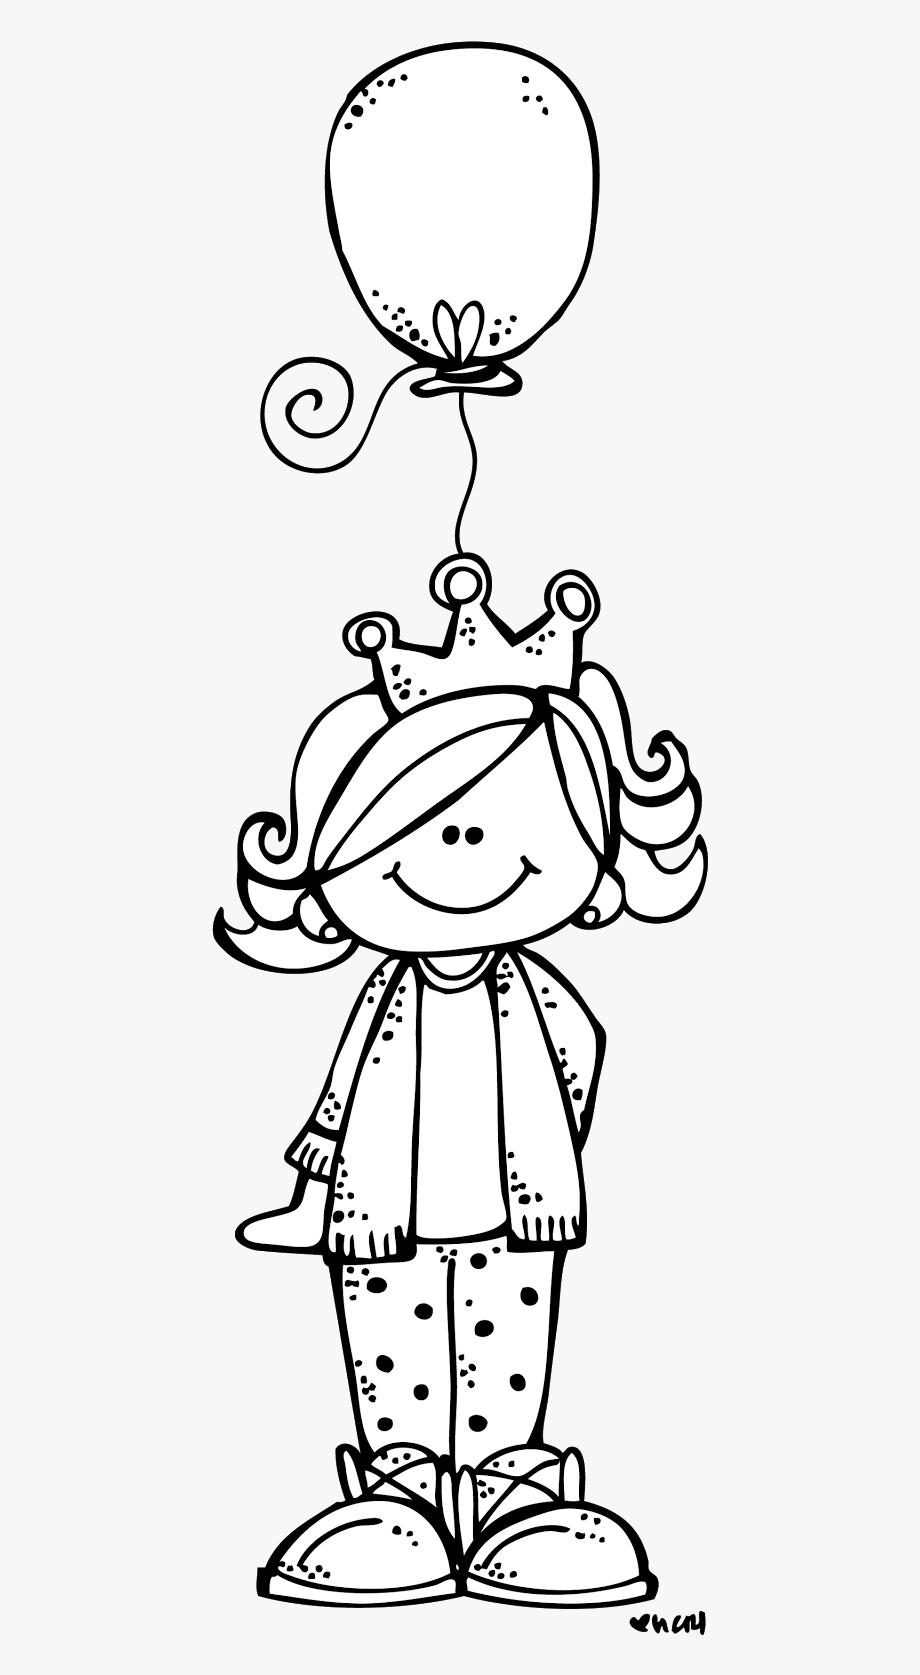 Melonheadz Illustrating Birthday Week Day Coloring.